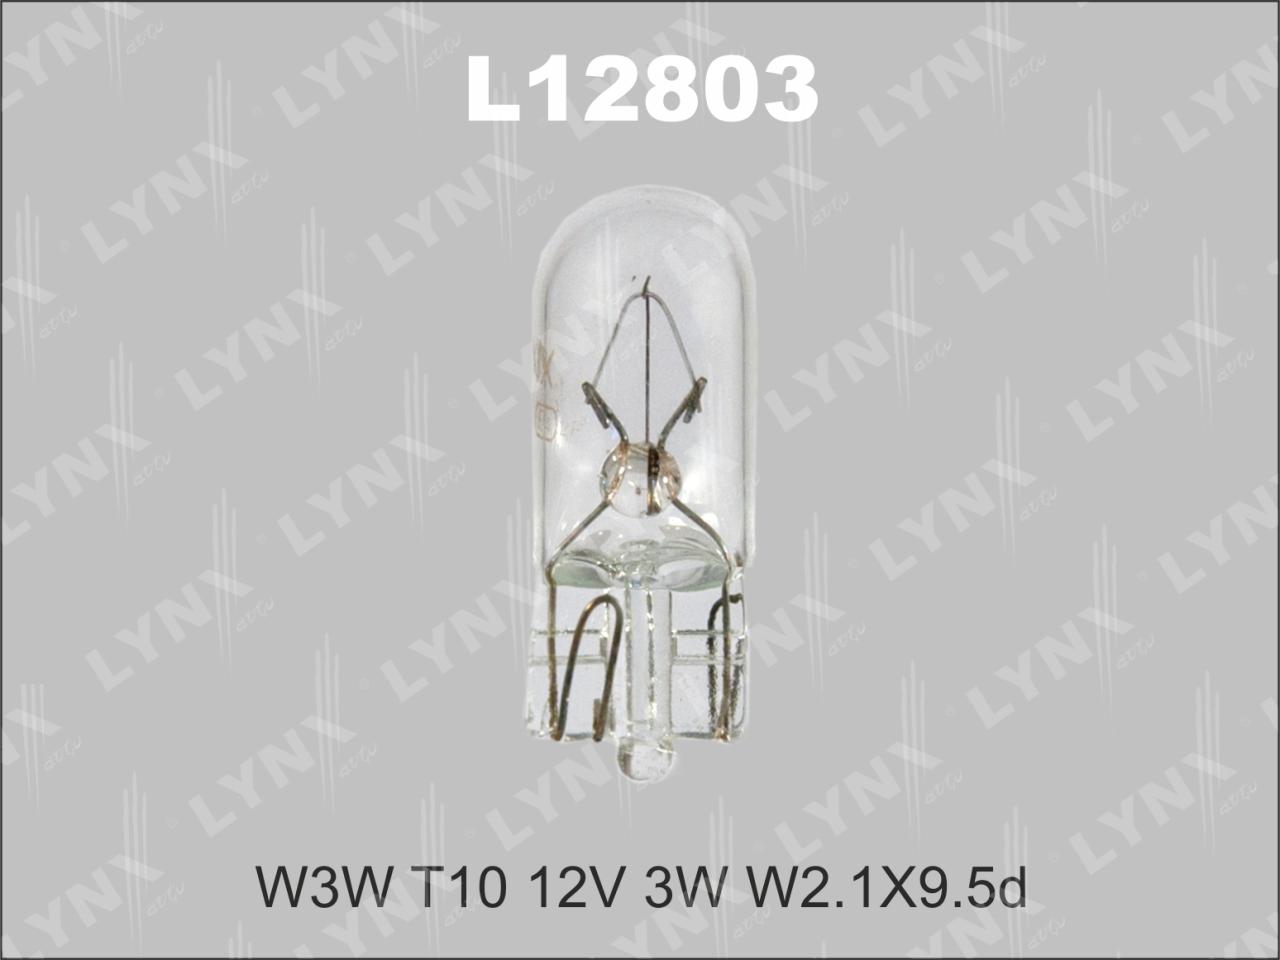 12803 W3W T10 12V3WW2.1X9.5D Лампа автом. LYNX, шт. (L12803)